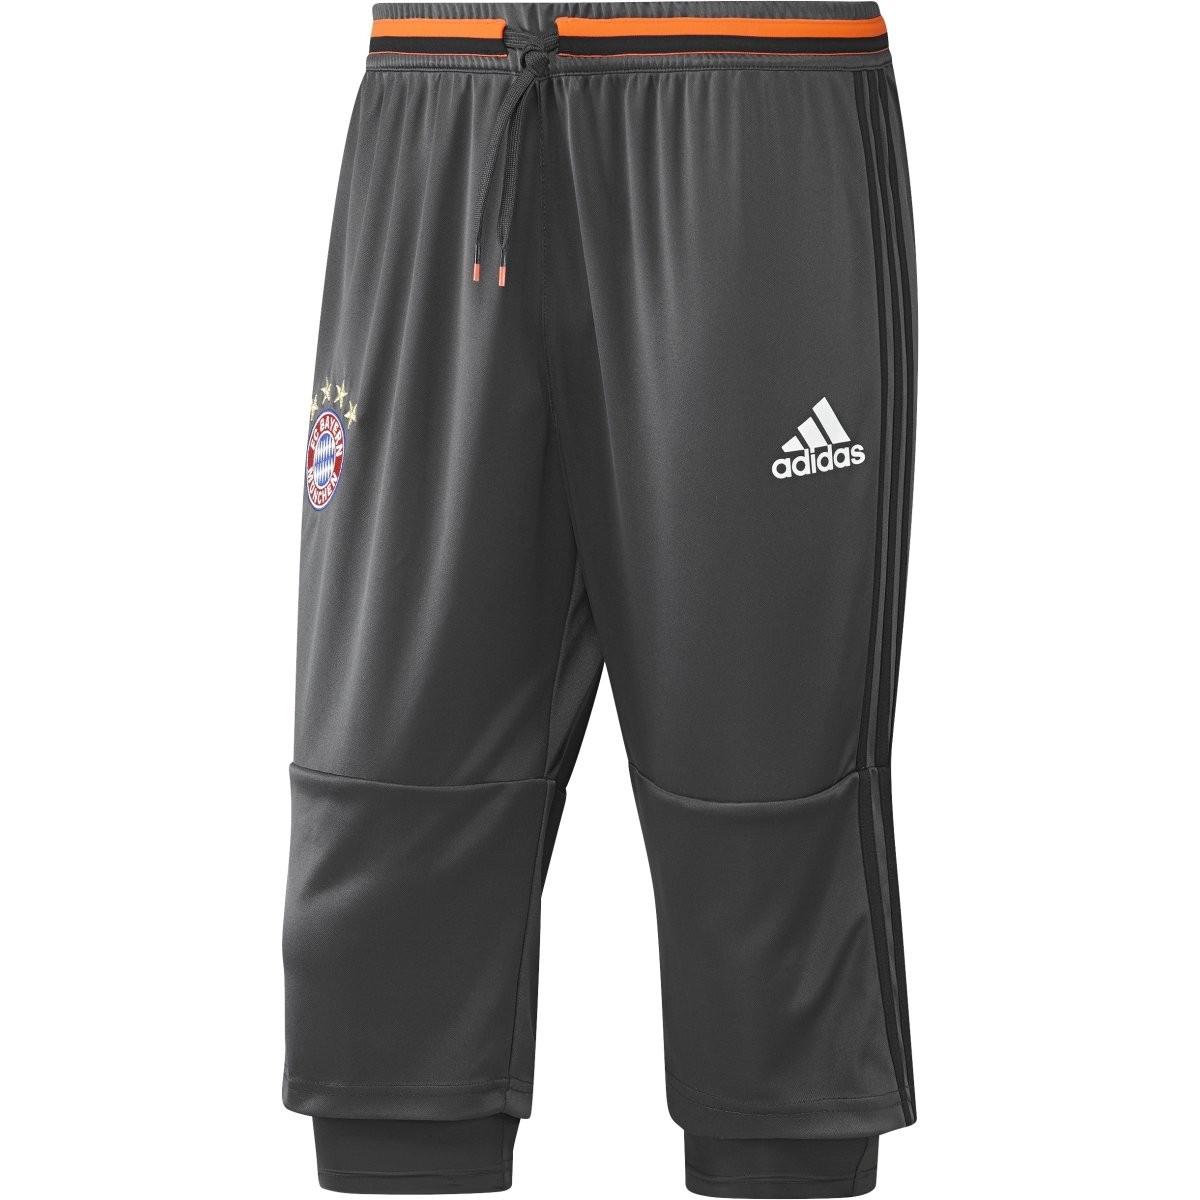 Mejorar habla conspiración  Pantalon de football adidas performance FC Bayern Munich